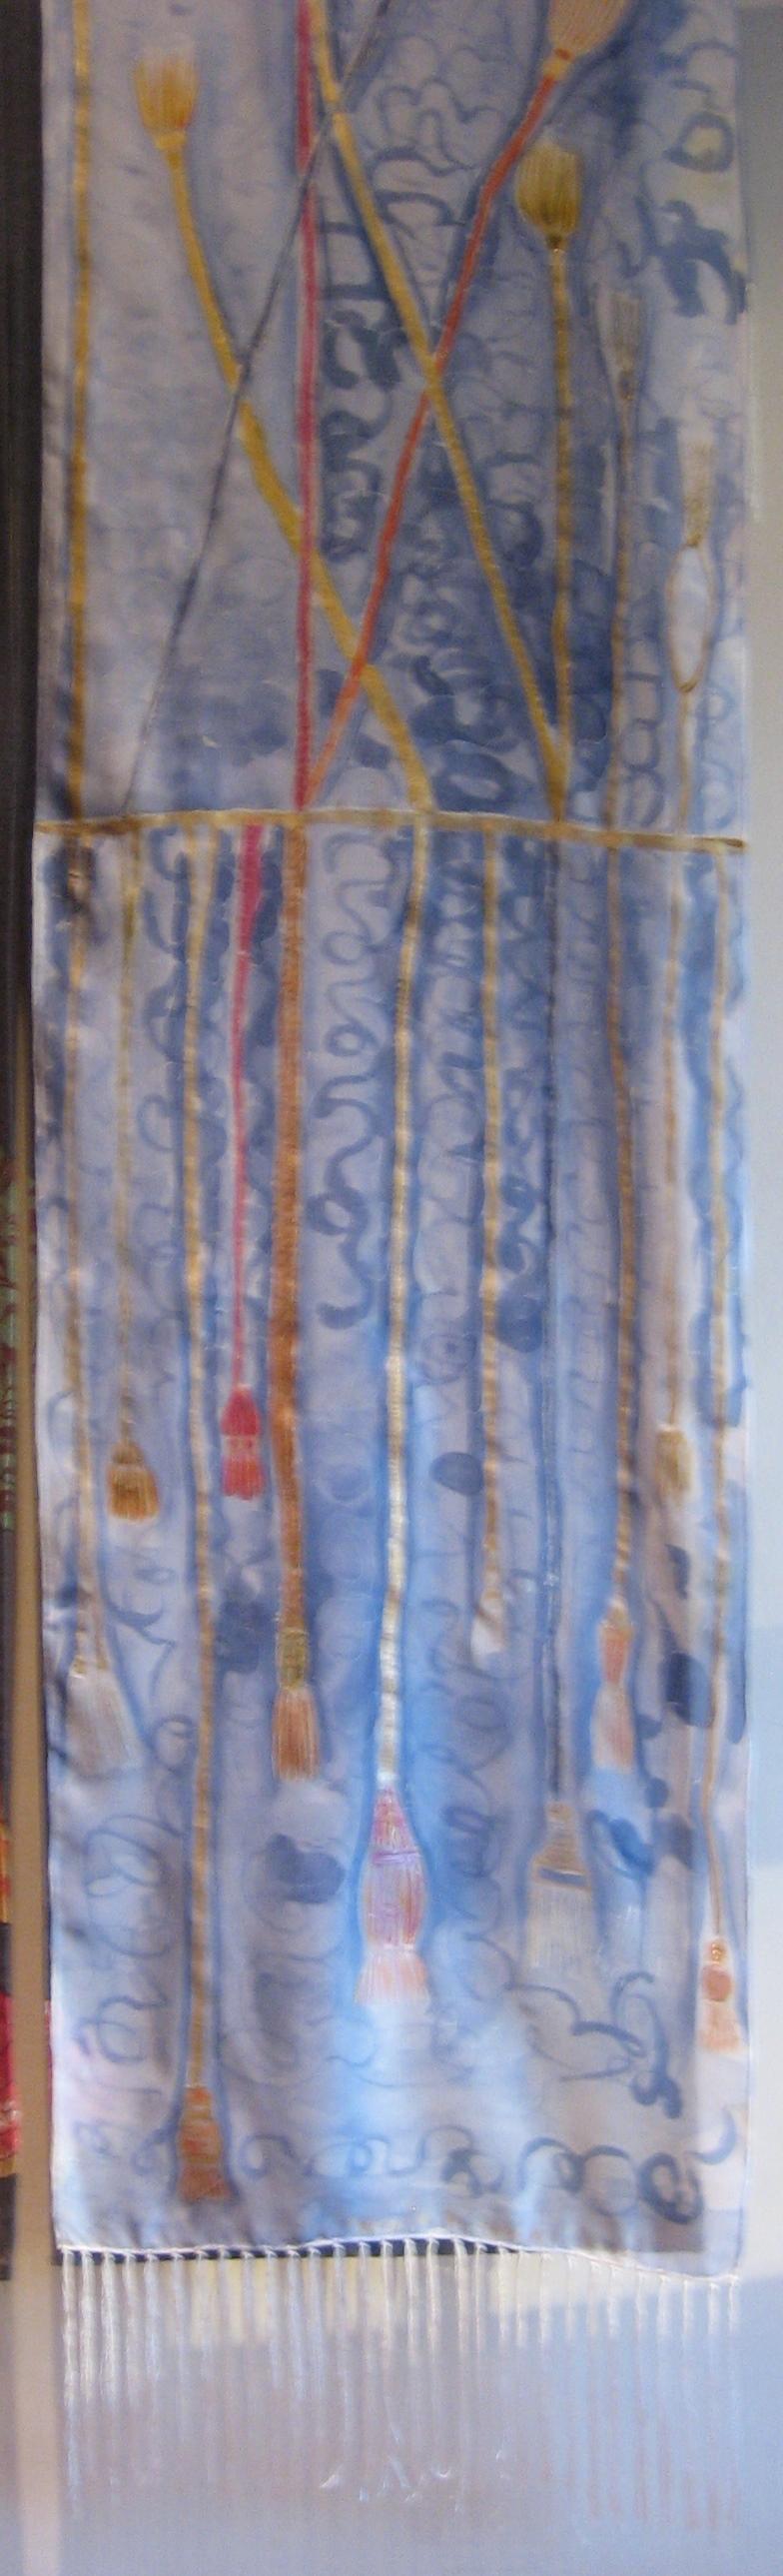 "Fular ""La Pasamneria"" seda habotai 180 x 45 cm"